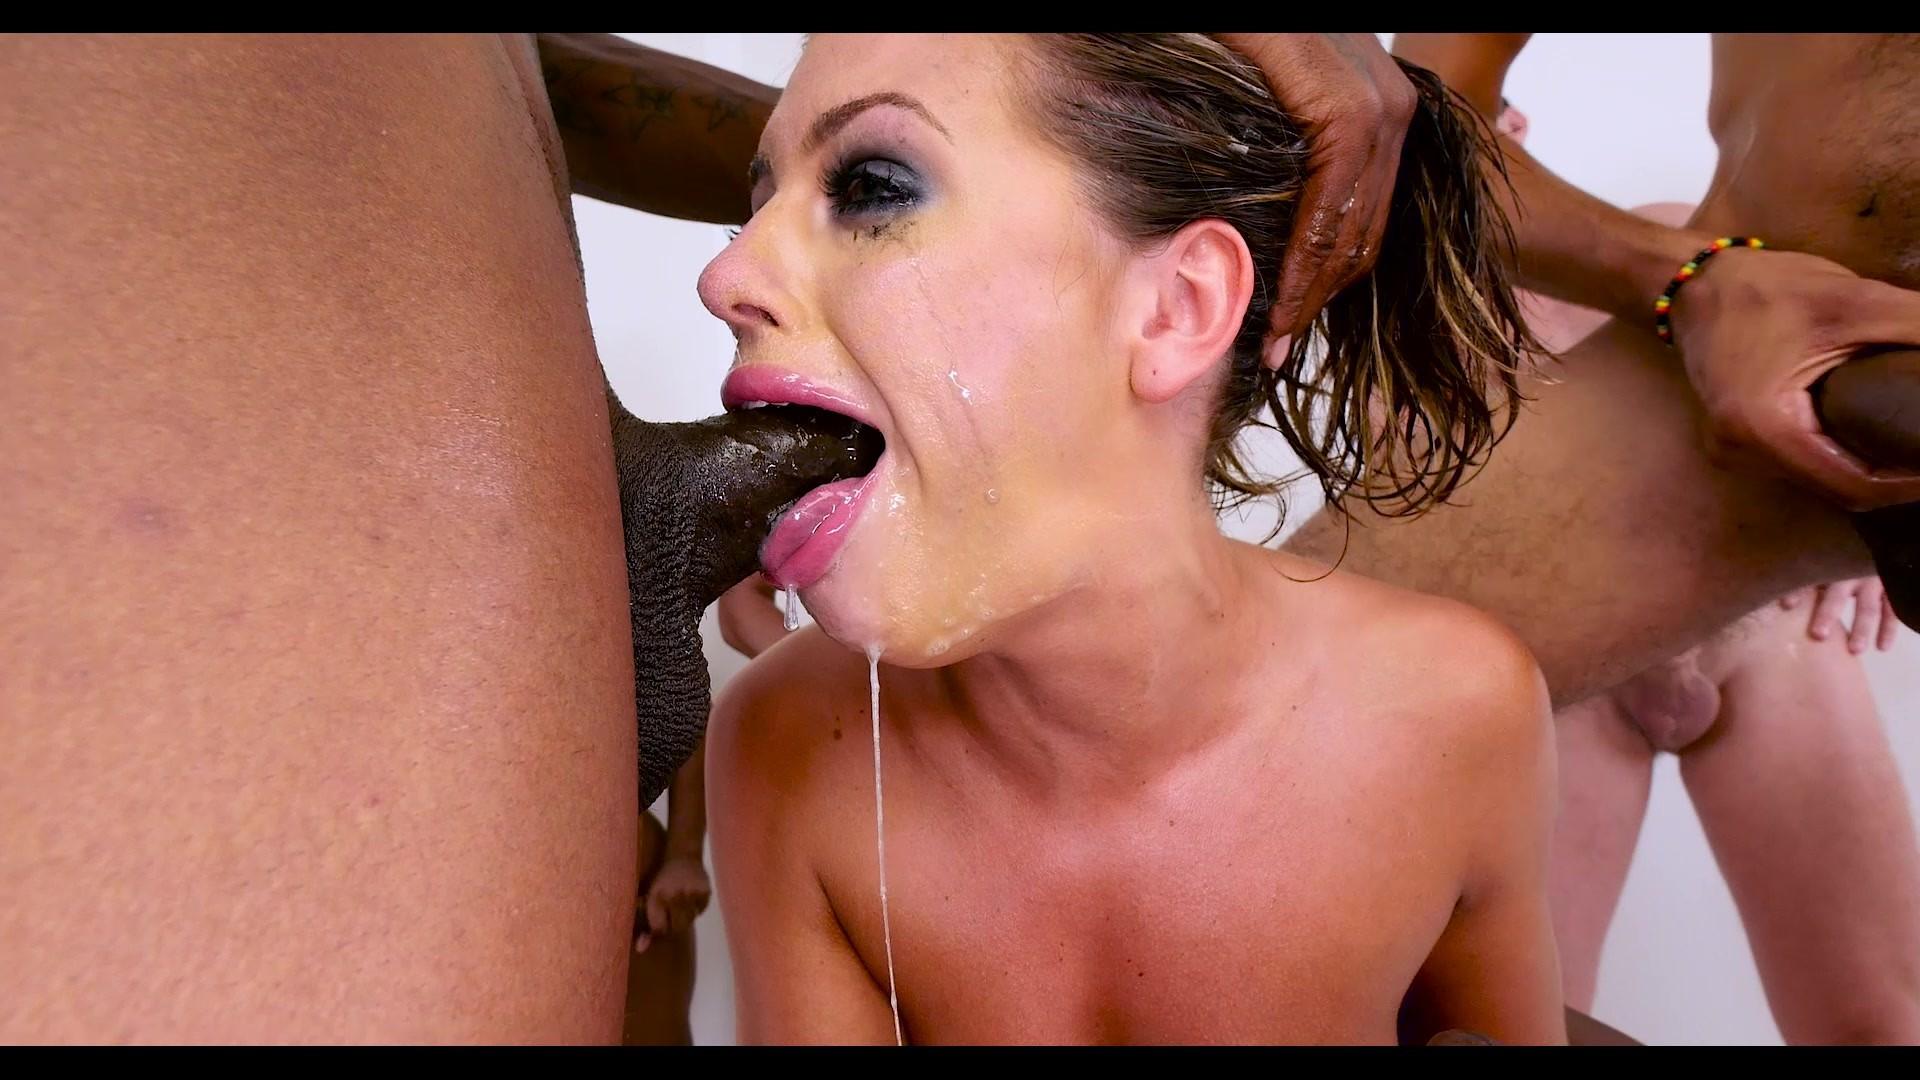 Adriana Chechik The Ultimate Slut adriana chechik the ultimate slut 2015 adult dvd empire